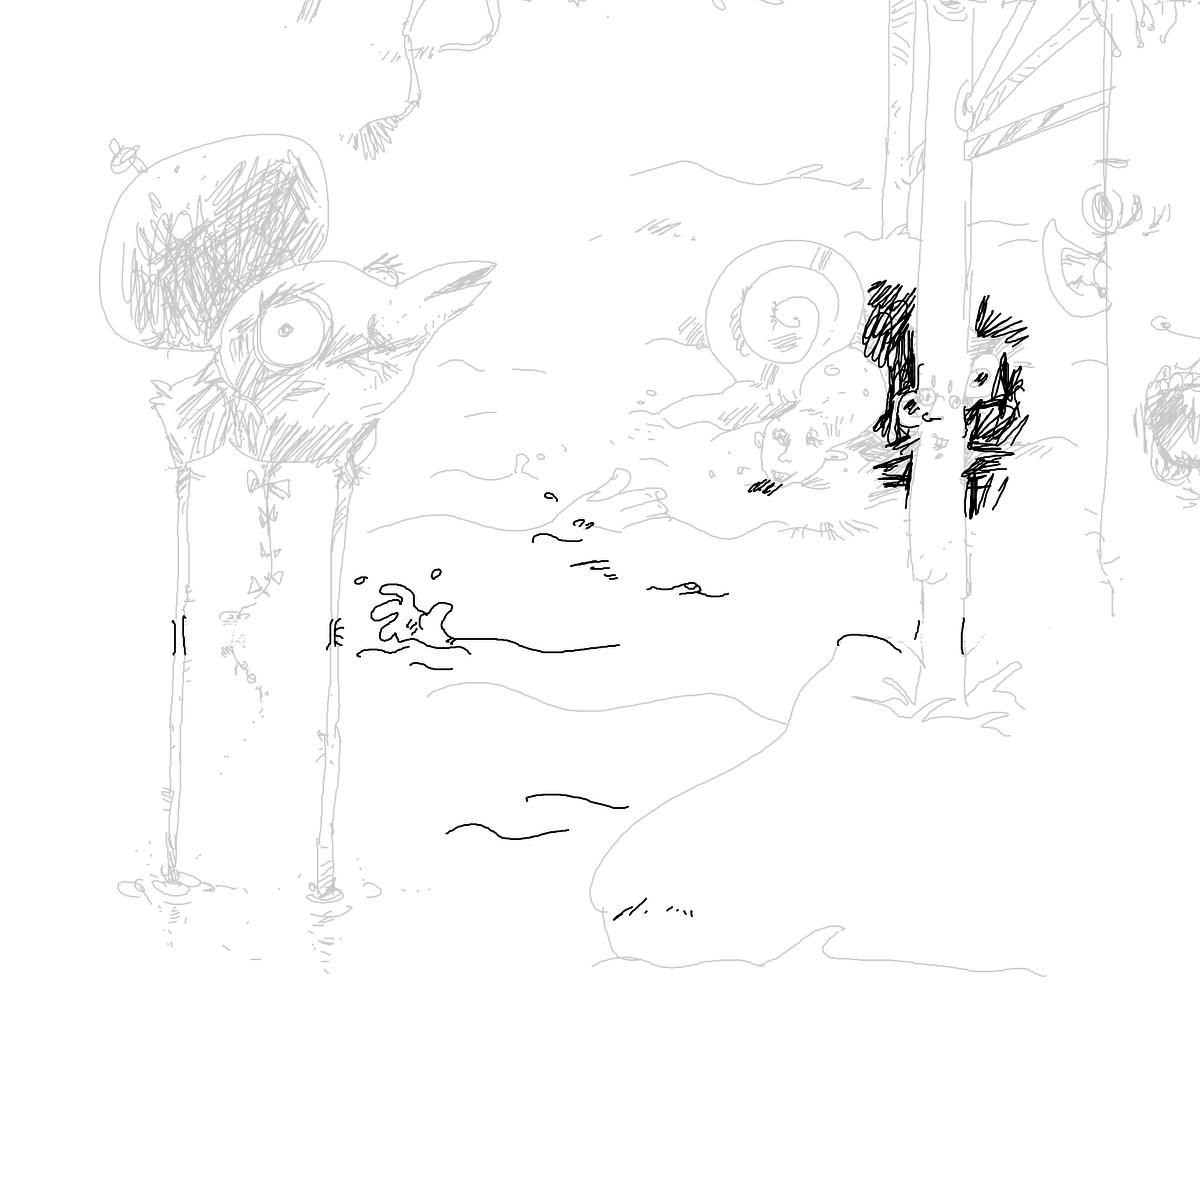 BAAAM drawing#18102 lat:78.4207305908203100lng: -4.4904217720031740